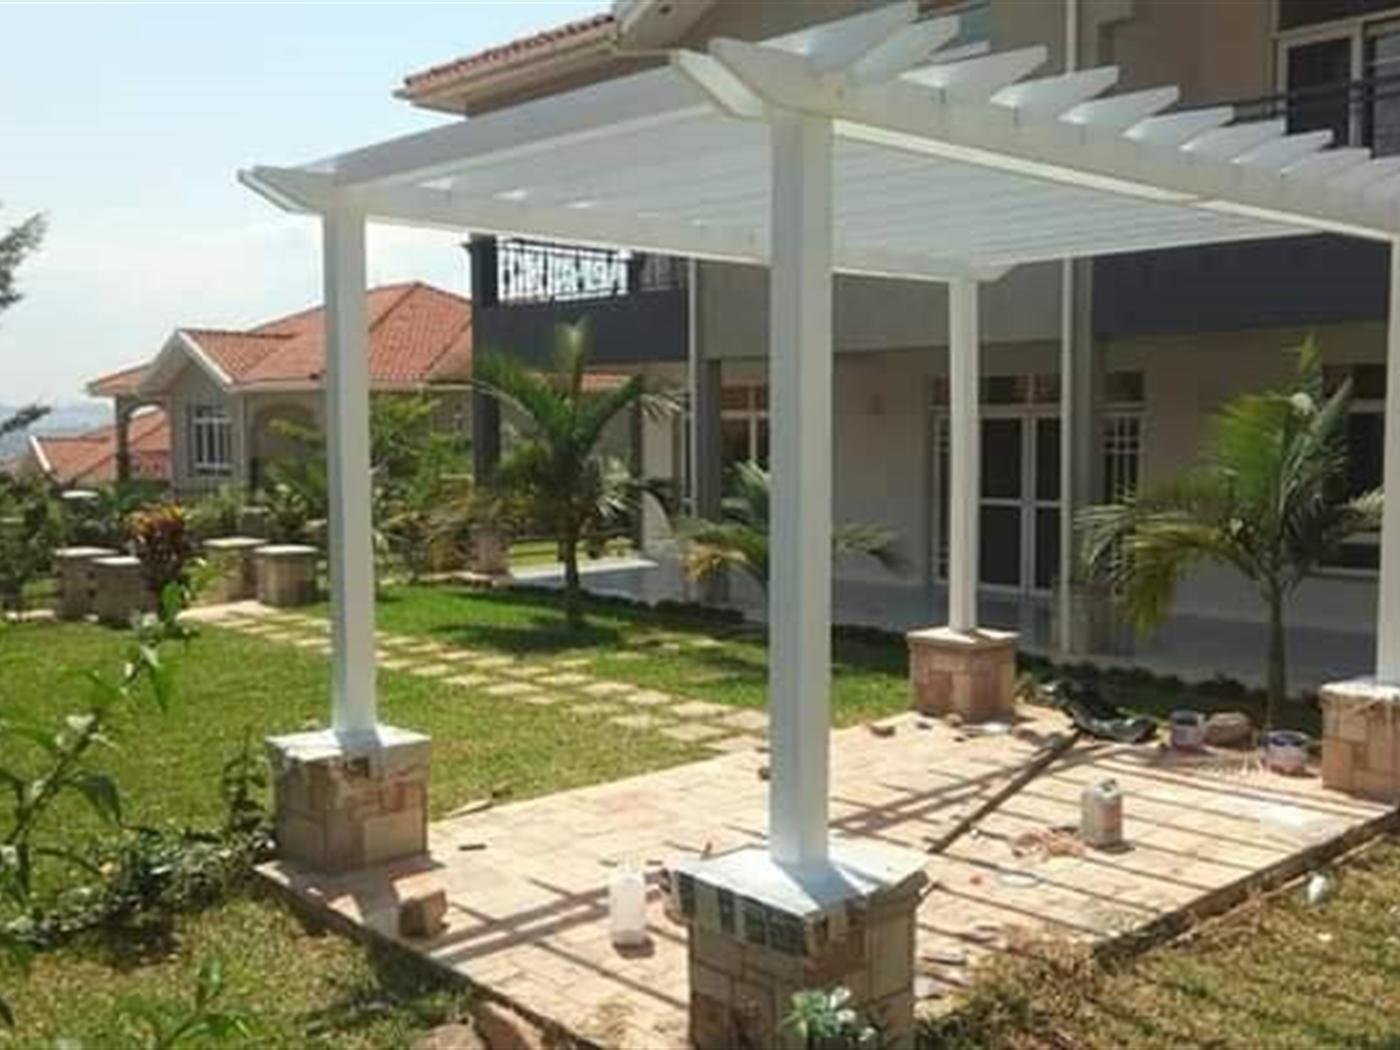 Town House for sale in Muyenga Kampala